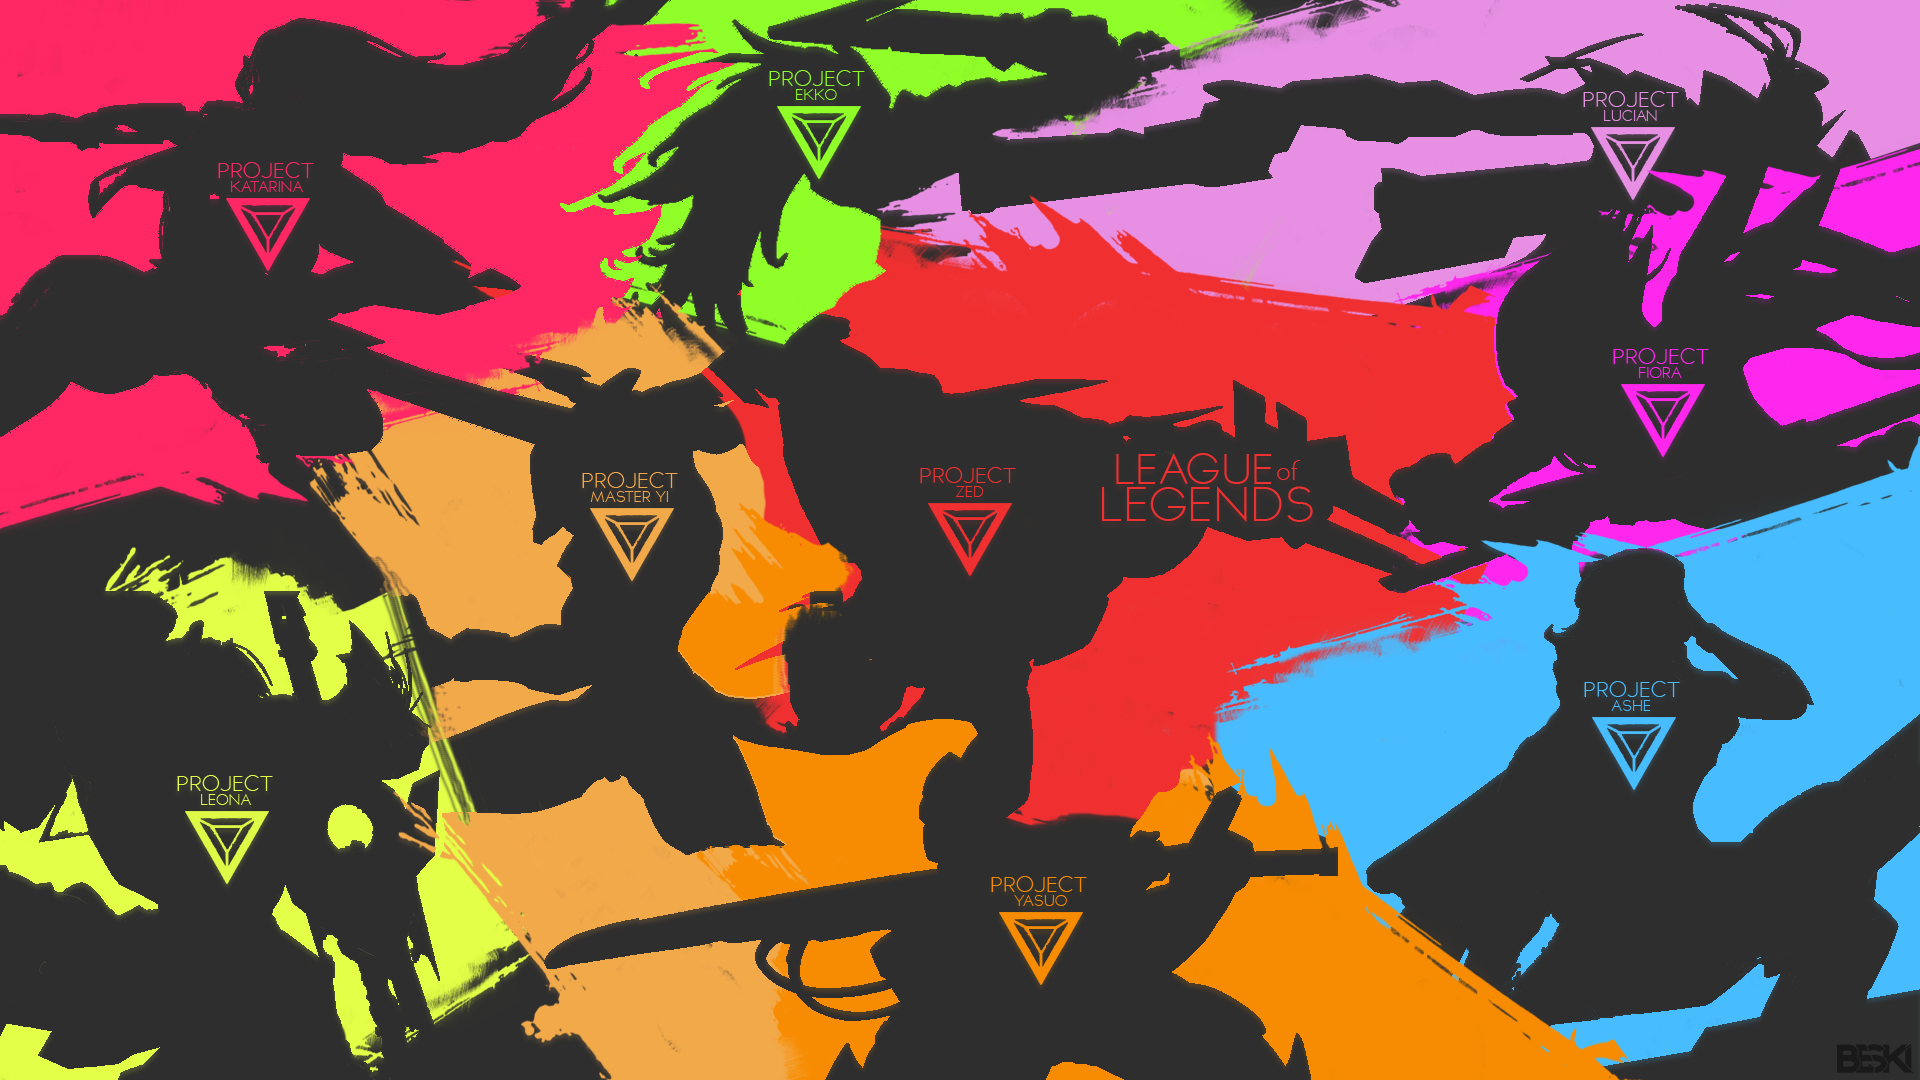 League Of Legends Project Skins Wallpaper By Beski